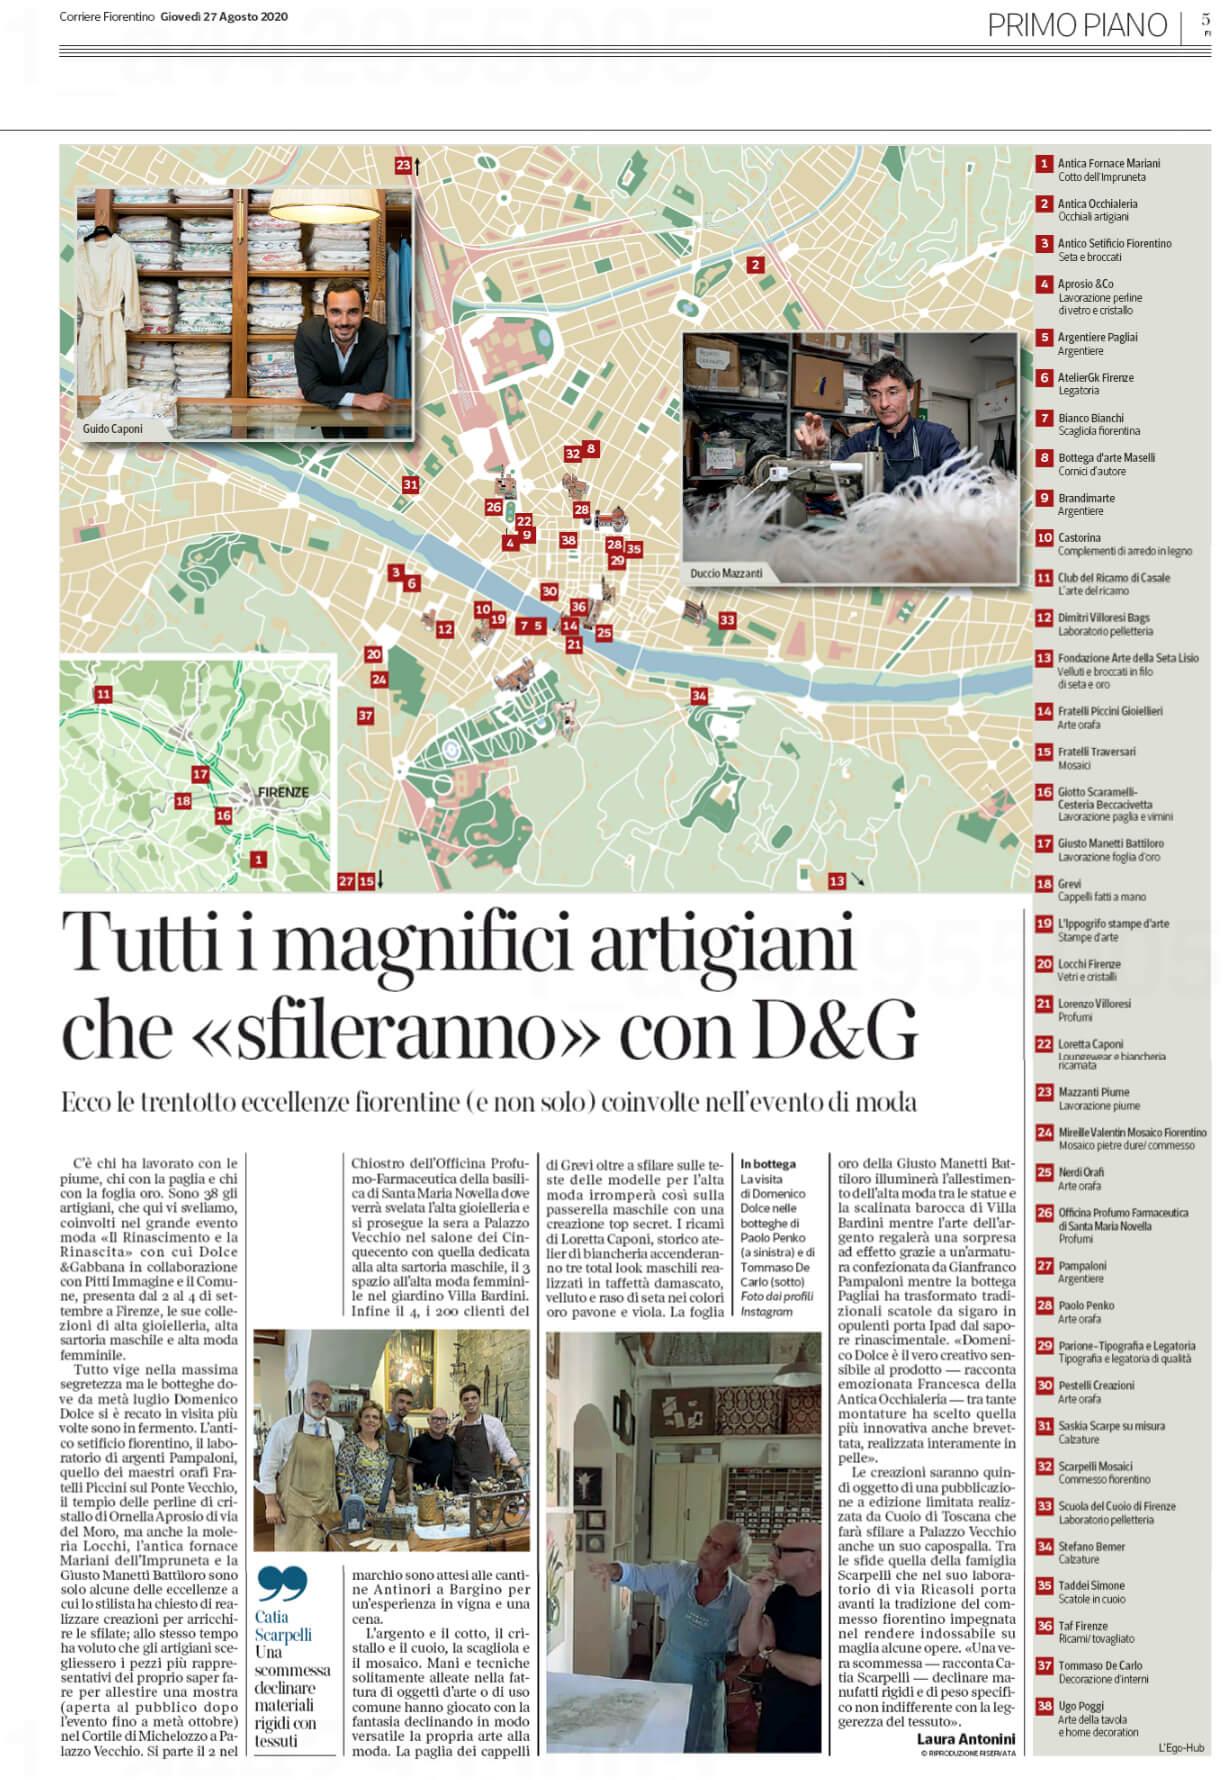 Dolce & Gabbana a Firenze